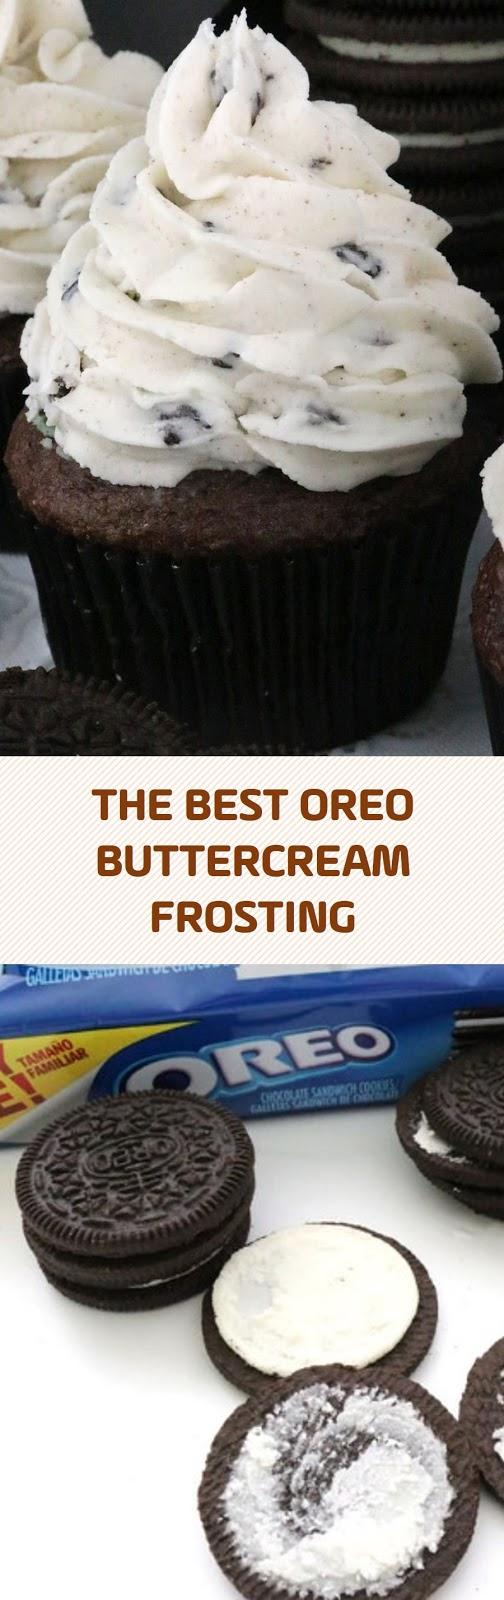 THE BEST OREO BUTTERCREAM FROSTING